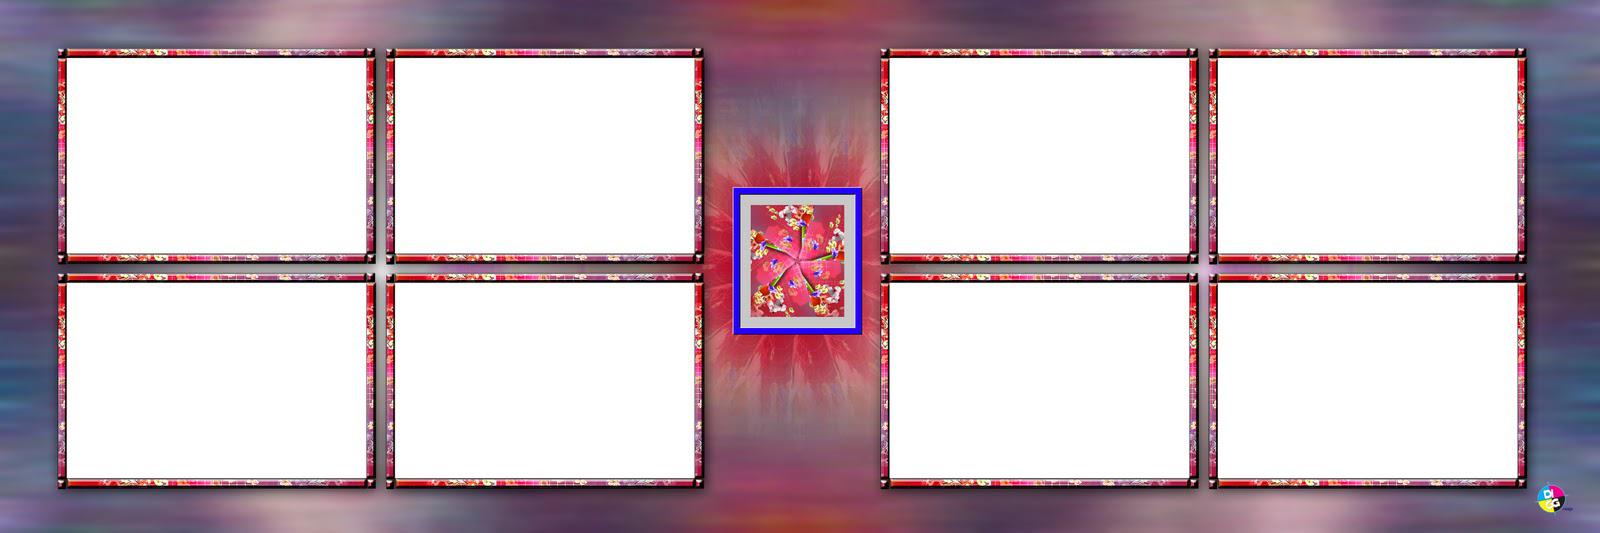 Karizma 12x36 Size Album Subject Sheets